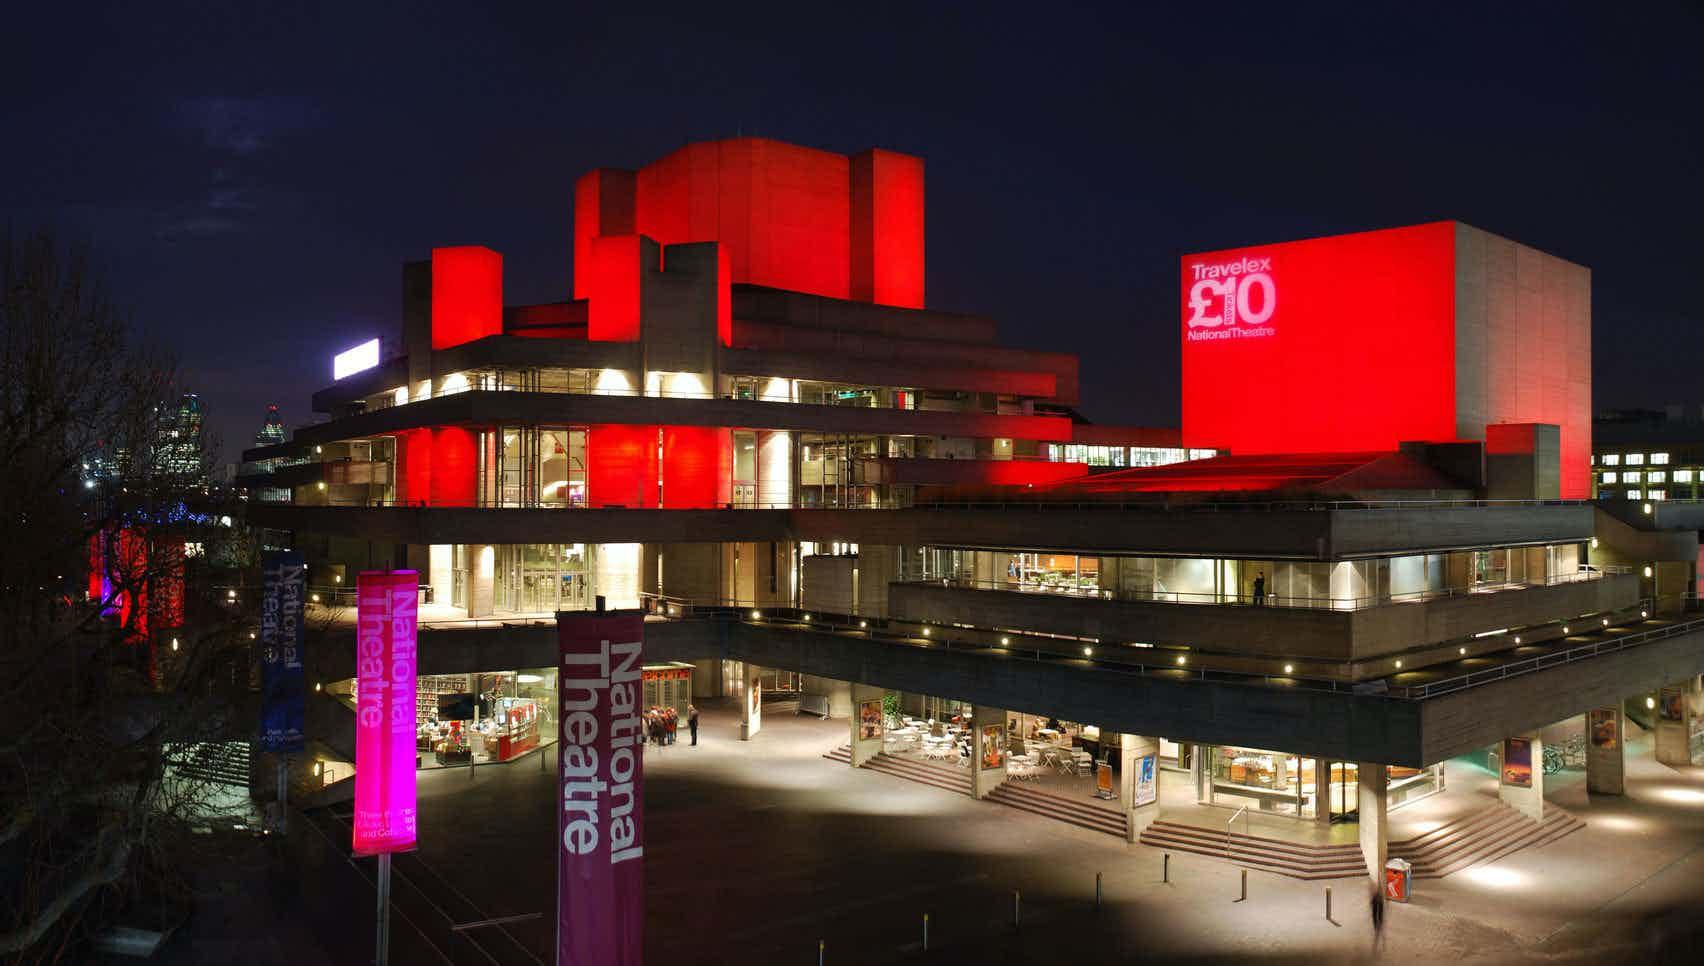 Lyttelton Lounge, National Theatre